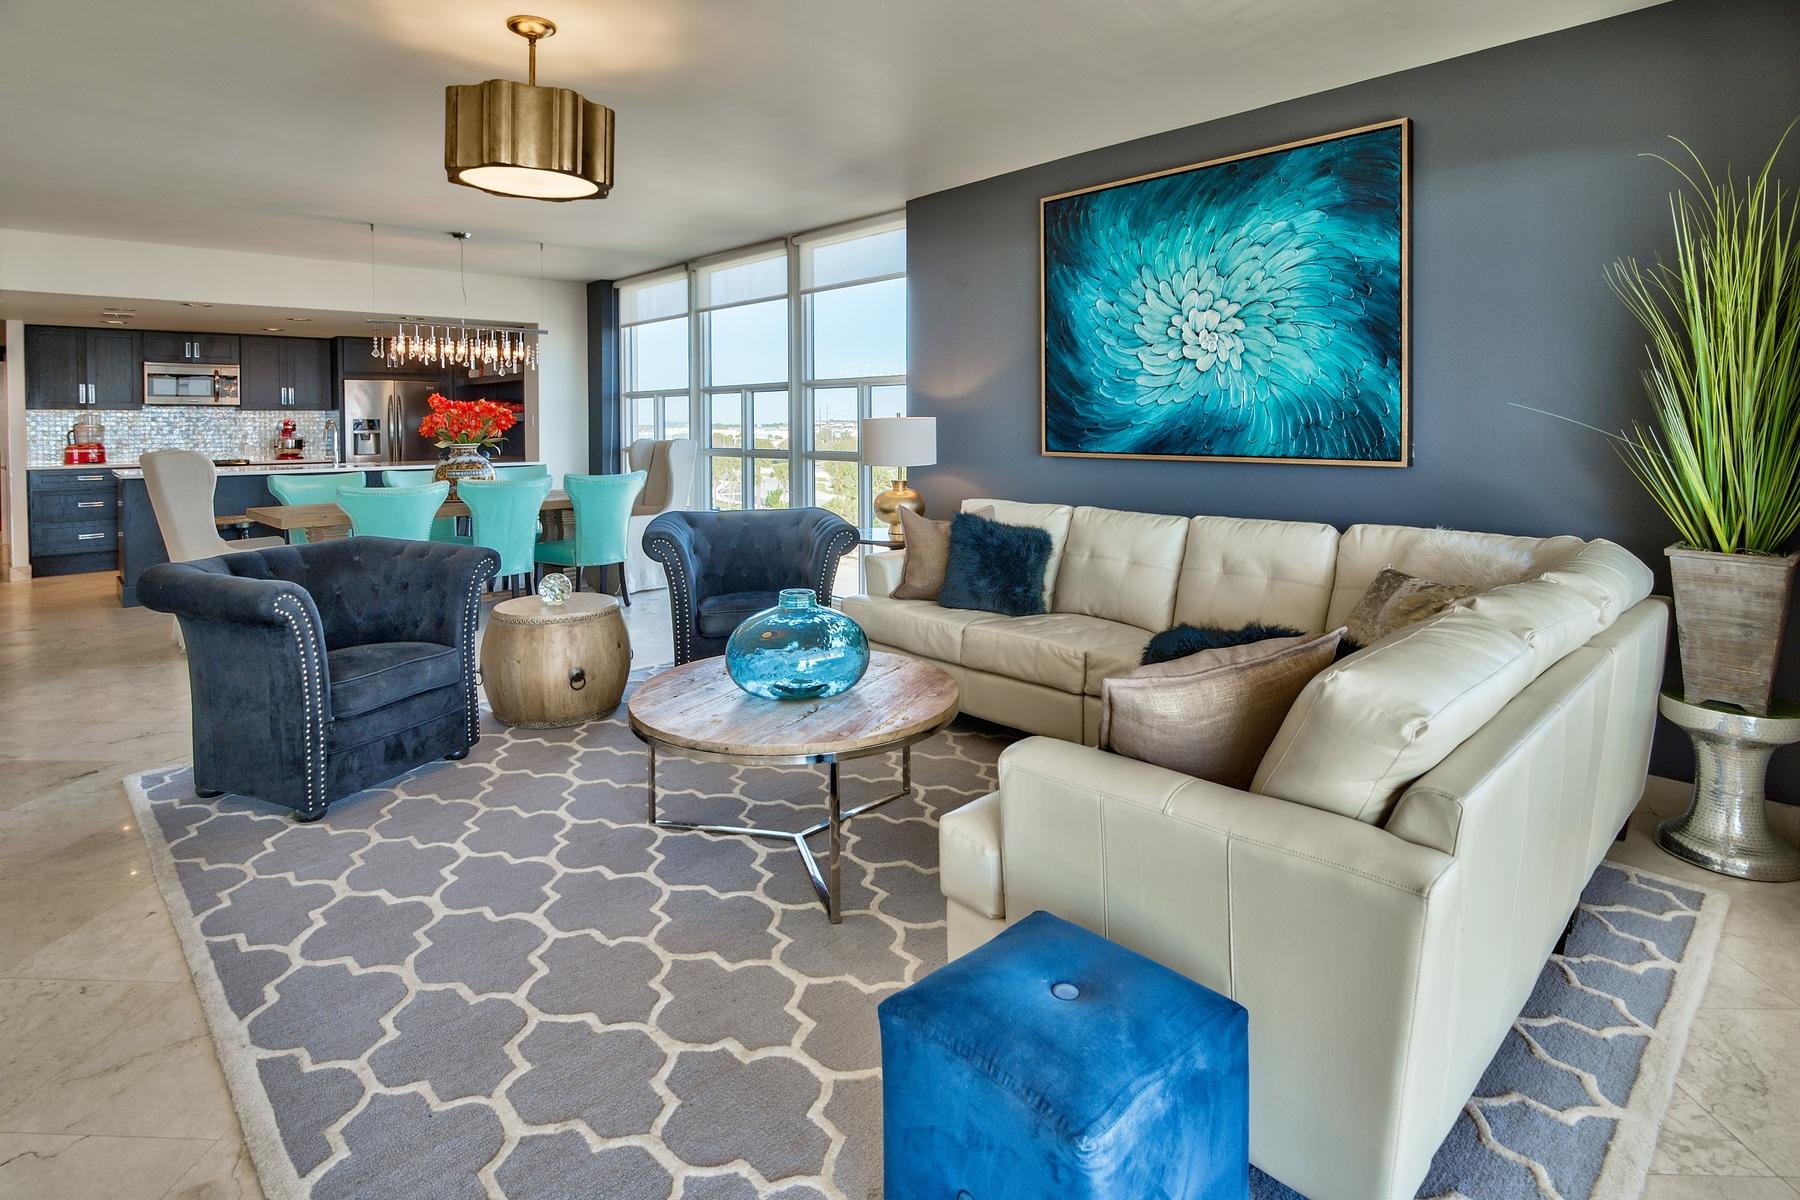 Condominium for Sale at PROFESSIONAL COASTAL DECOR AND MAGNIFICENT GULF VIEWS 1751 Scenic Highway 98 501 Destin, Florida, 32541 United States